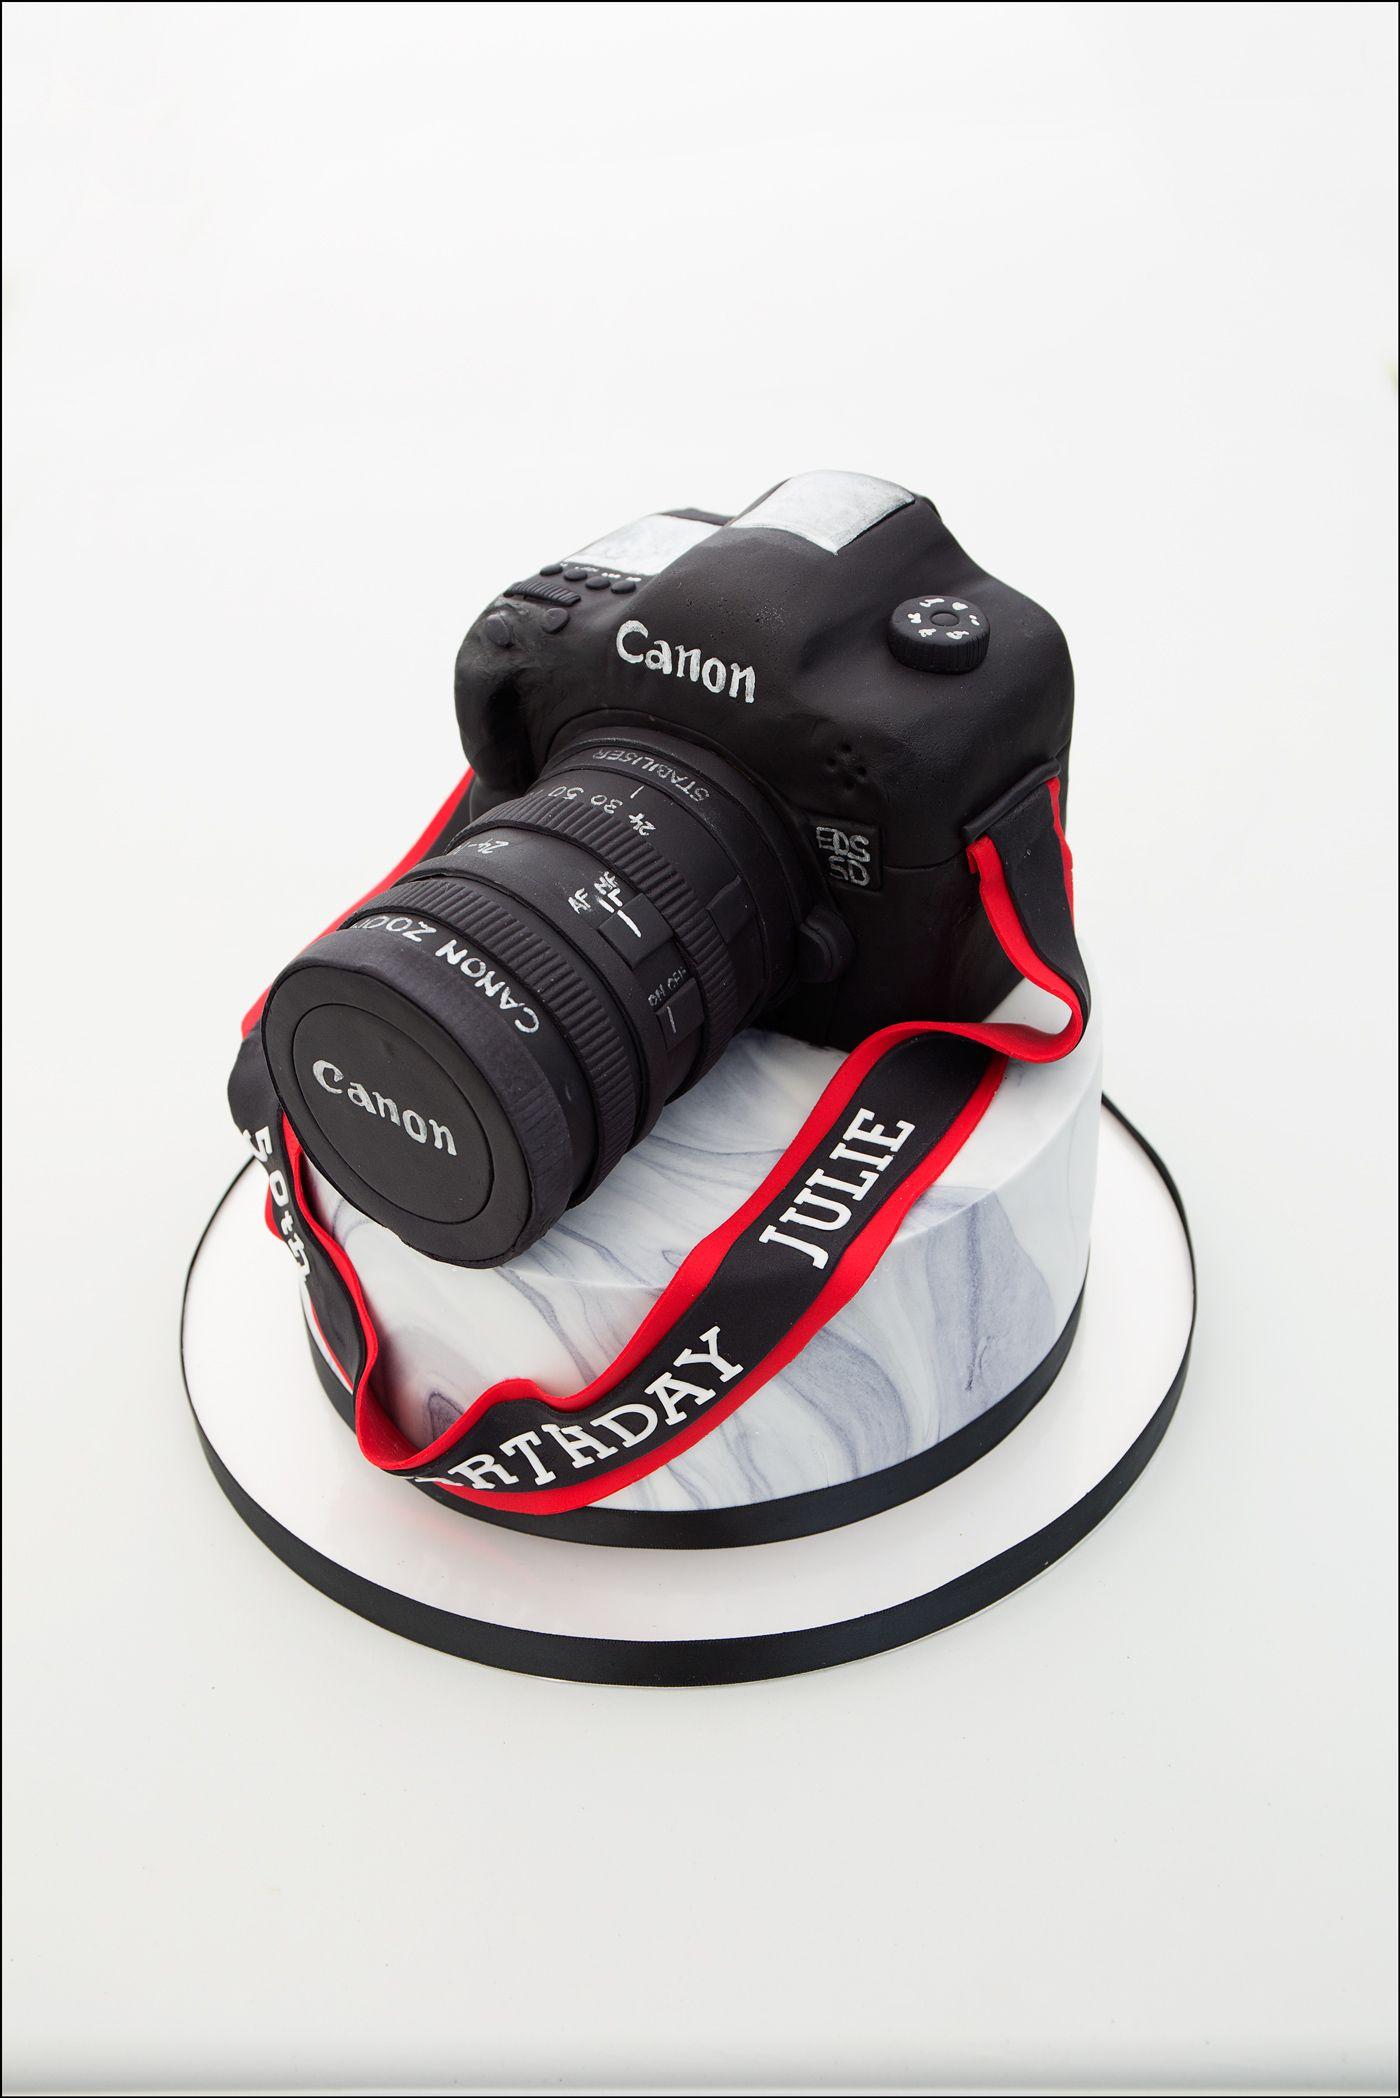 Cool Nikon Camera Birthday Cake All Edible Thanks Pettinice Com Personalised Birthday Cards Sponlily Jamesorg